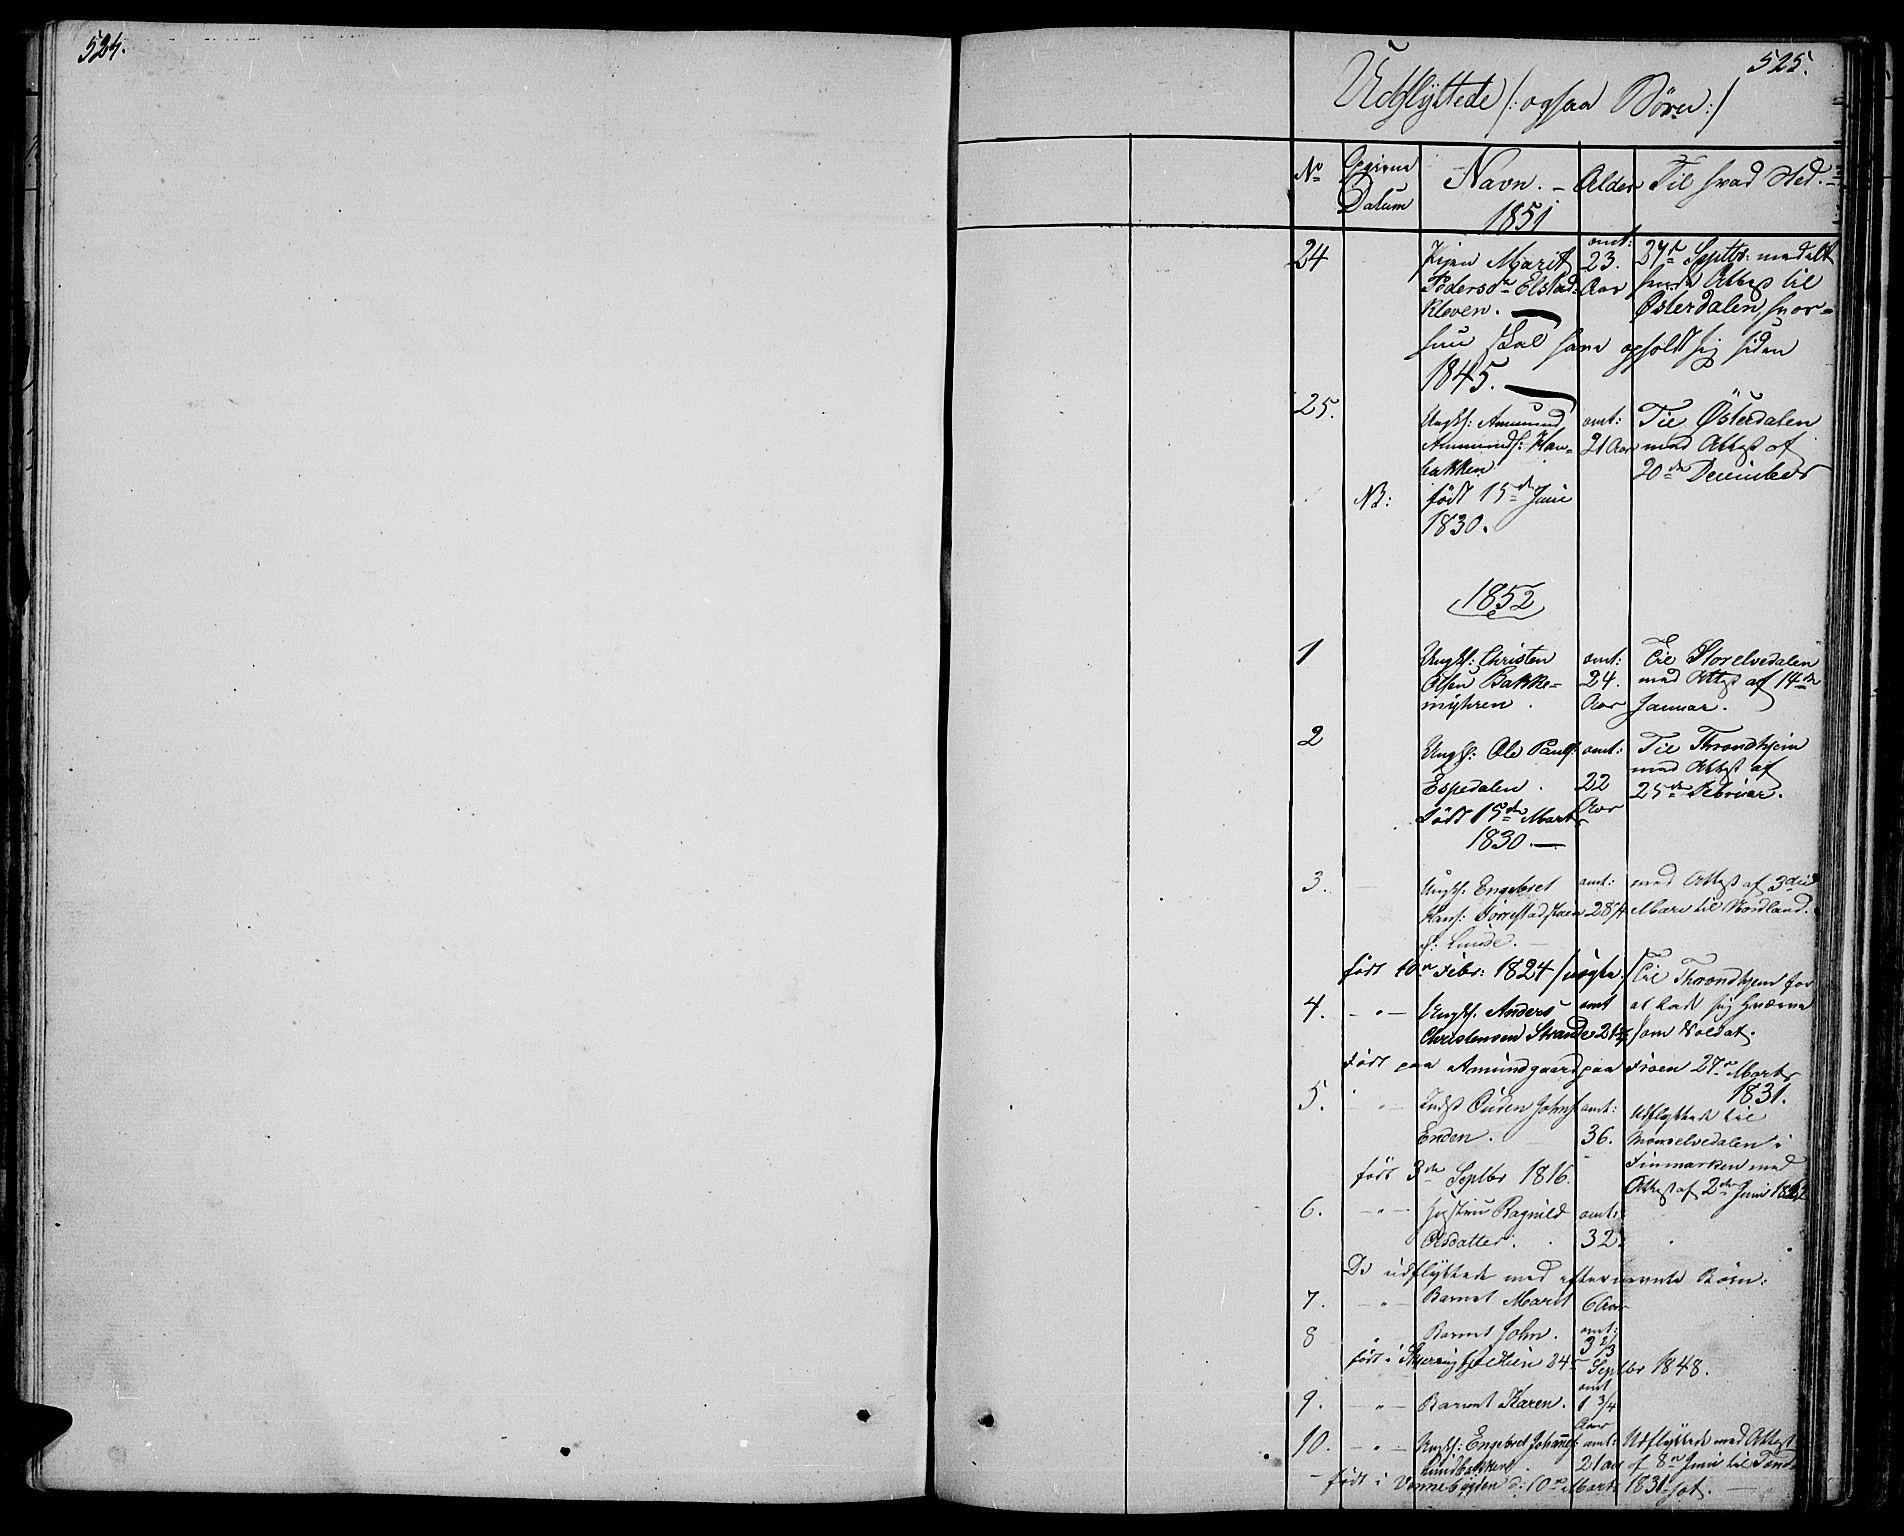 SAH, Ringebu prestekontor, Klokkerbok nr. 2, 1839-1853, s. 524-525